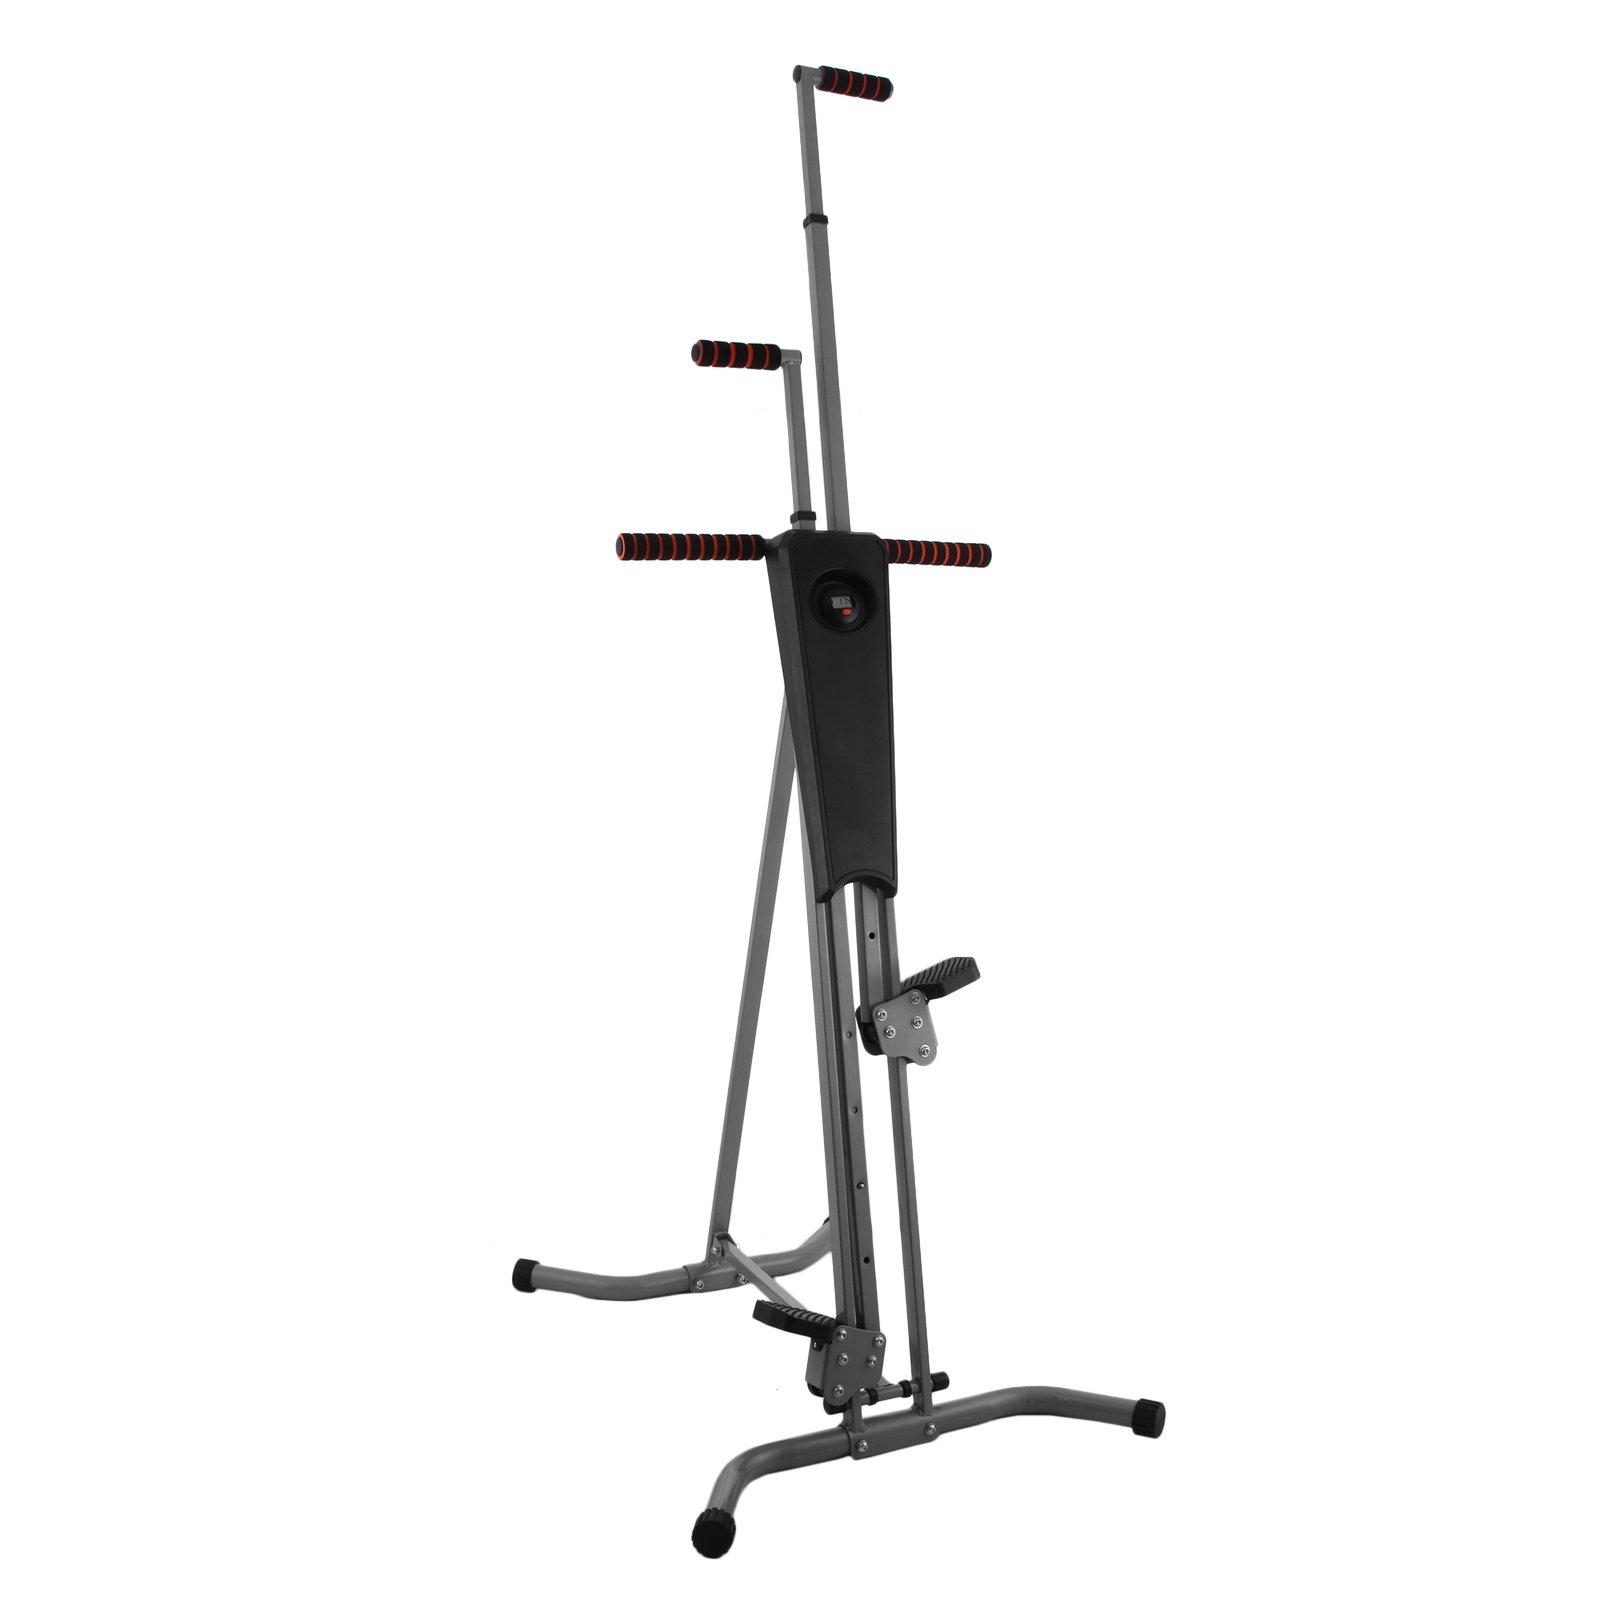 Popsport 440LBS Climber Machine Fitness Stepper Climber Exercise Equipment Vertical Climber for Home Gym Exercise Stepper Cardio Climbing System (P8006,Gray) by Popsport (Image #1)